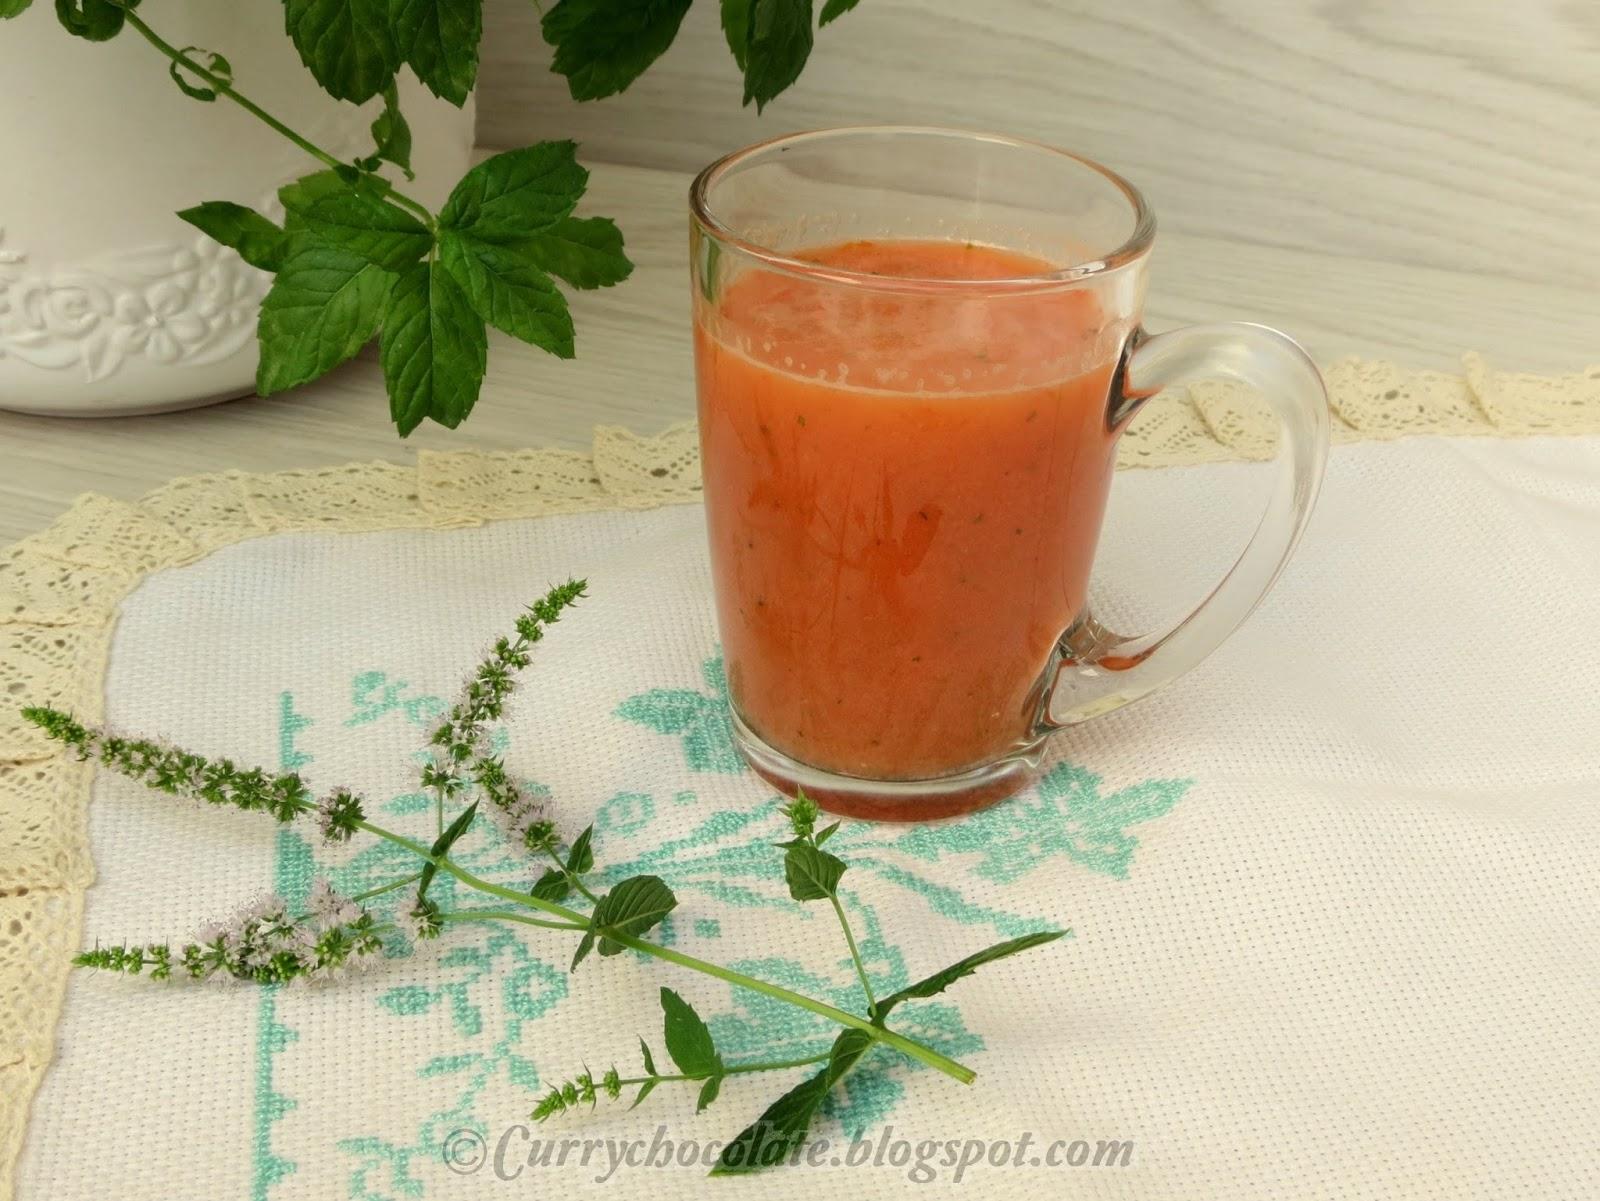 Gazpacho andaluz - Andalusian cold tomato soup